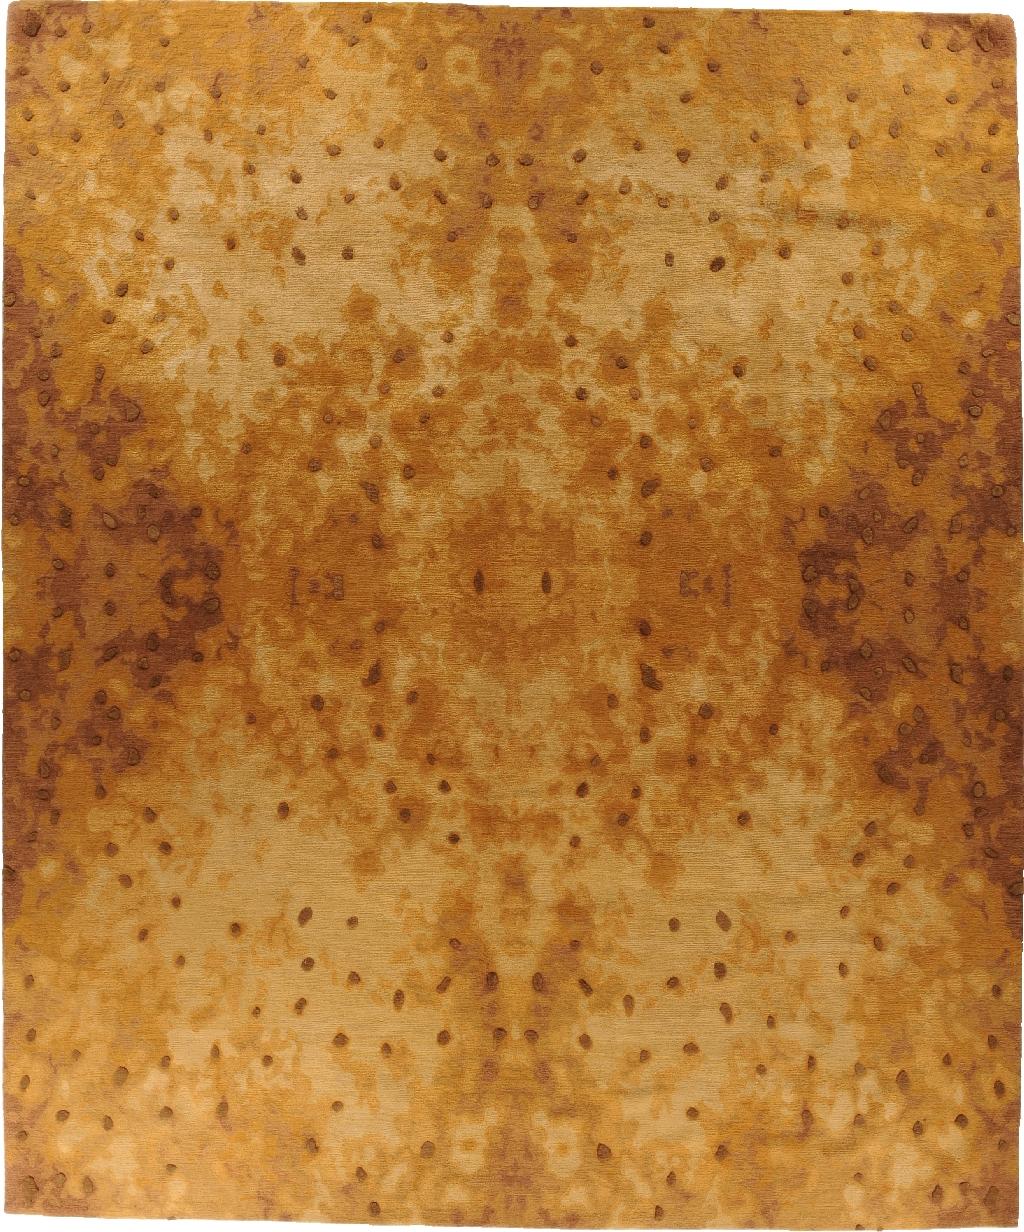 2000001 CASSIDA OSTRICH GOLD 300X25001 - OSTRICH GOLD